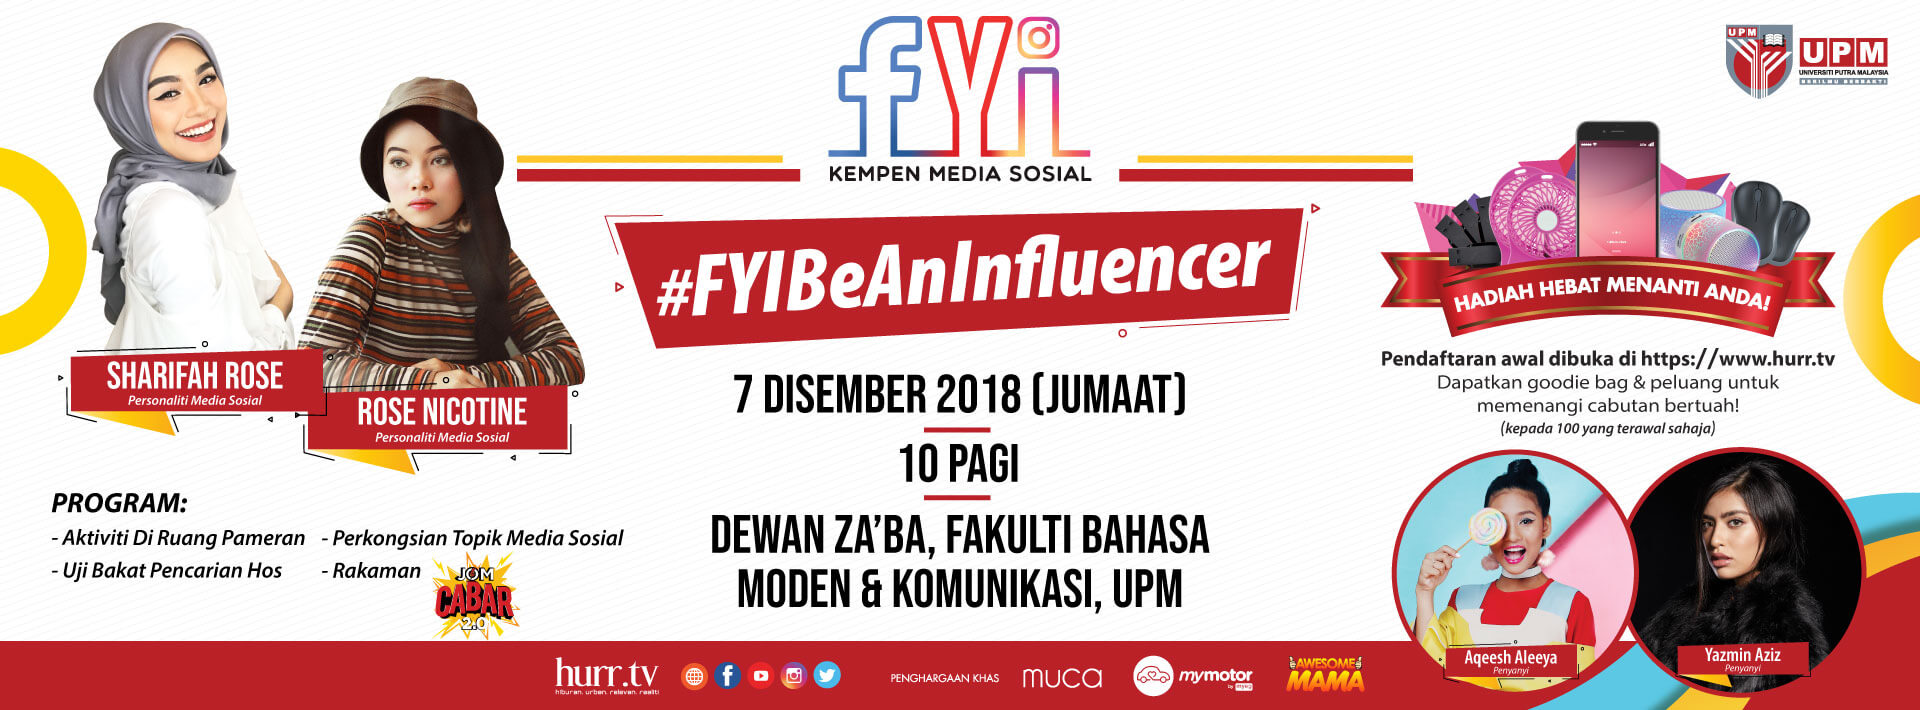 FYI-UPM-Cover-banner